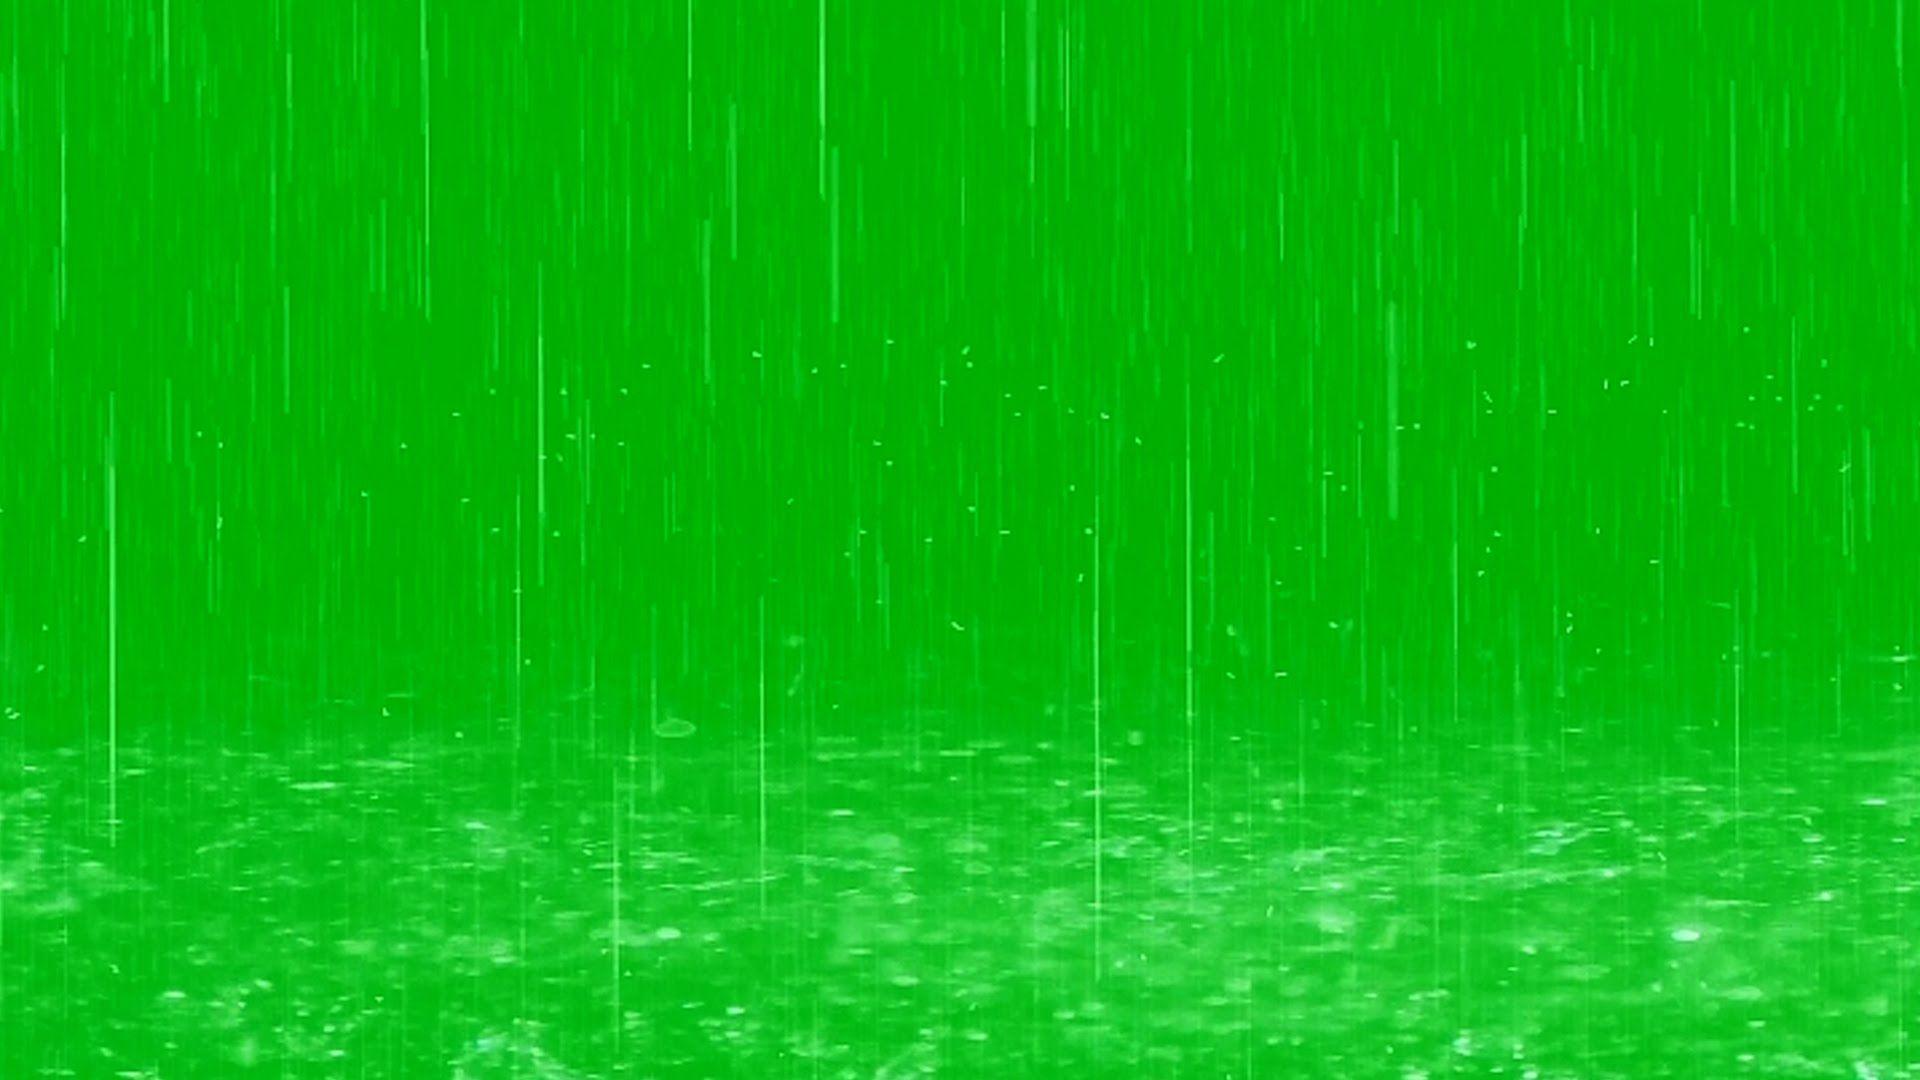 Raindrops Fall in Puddles Green Screen Effect Gambar